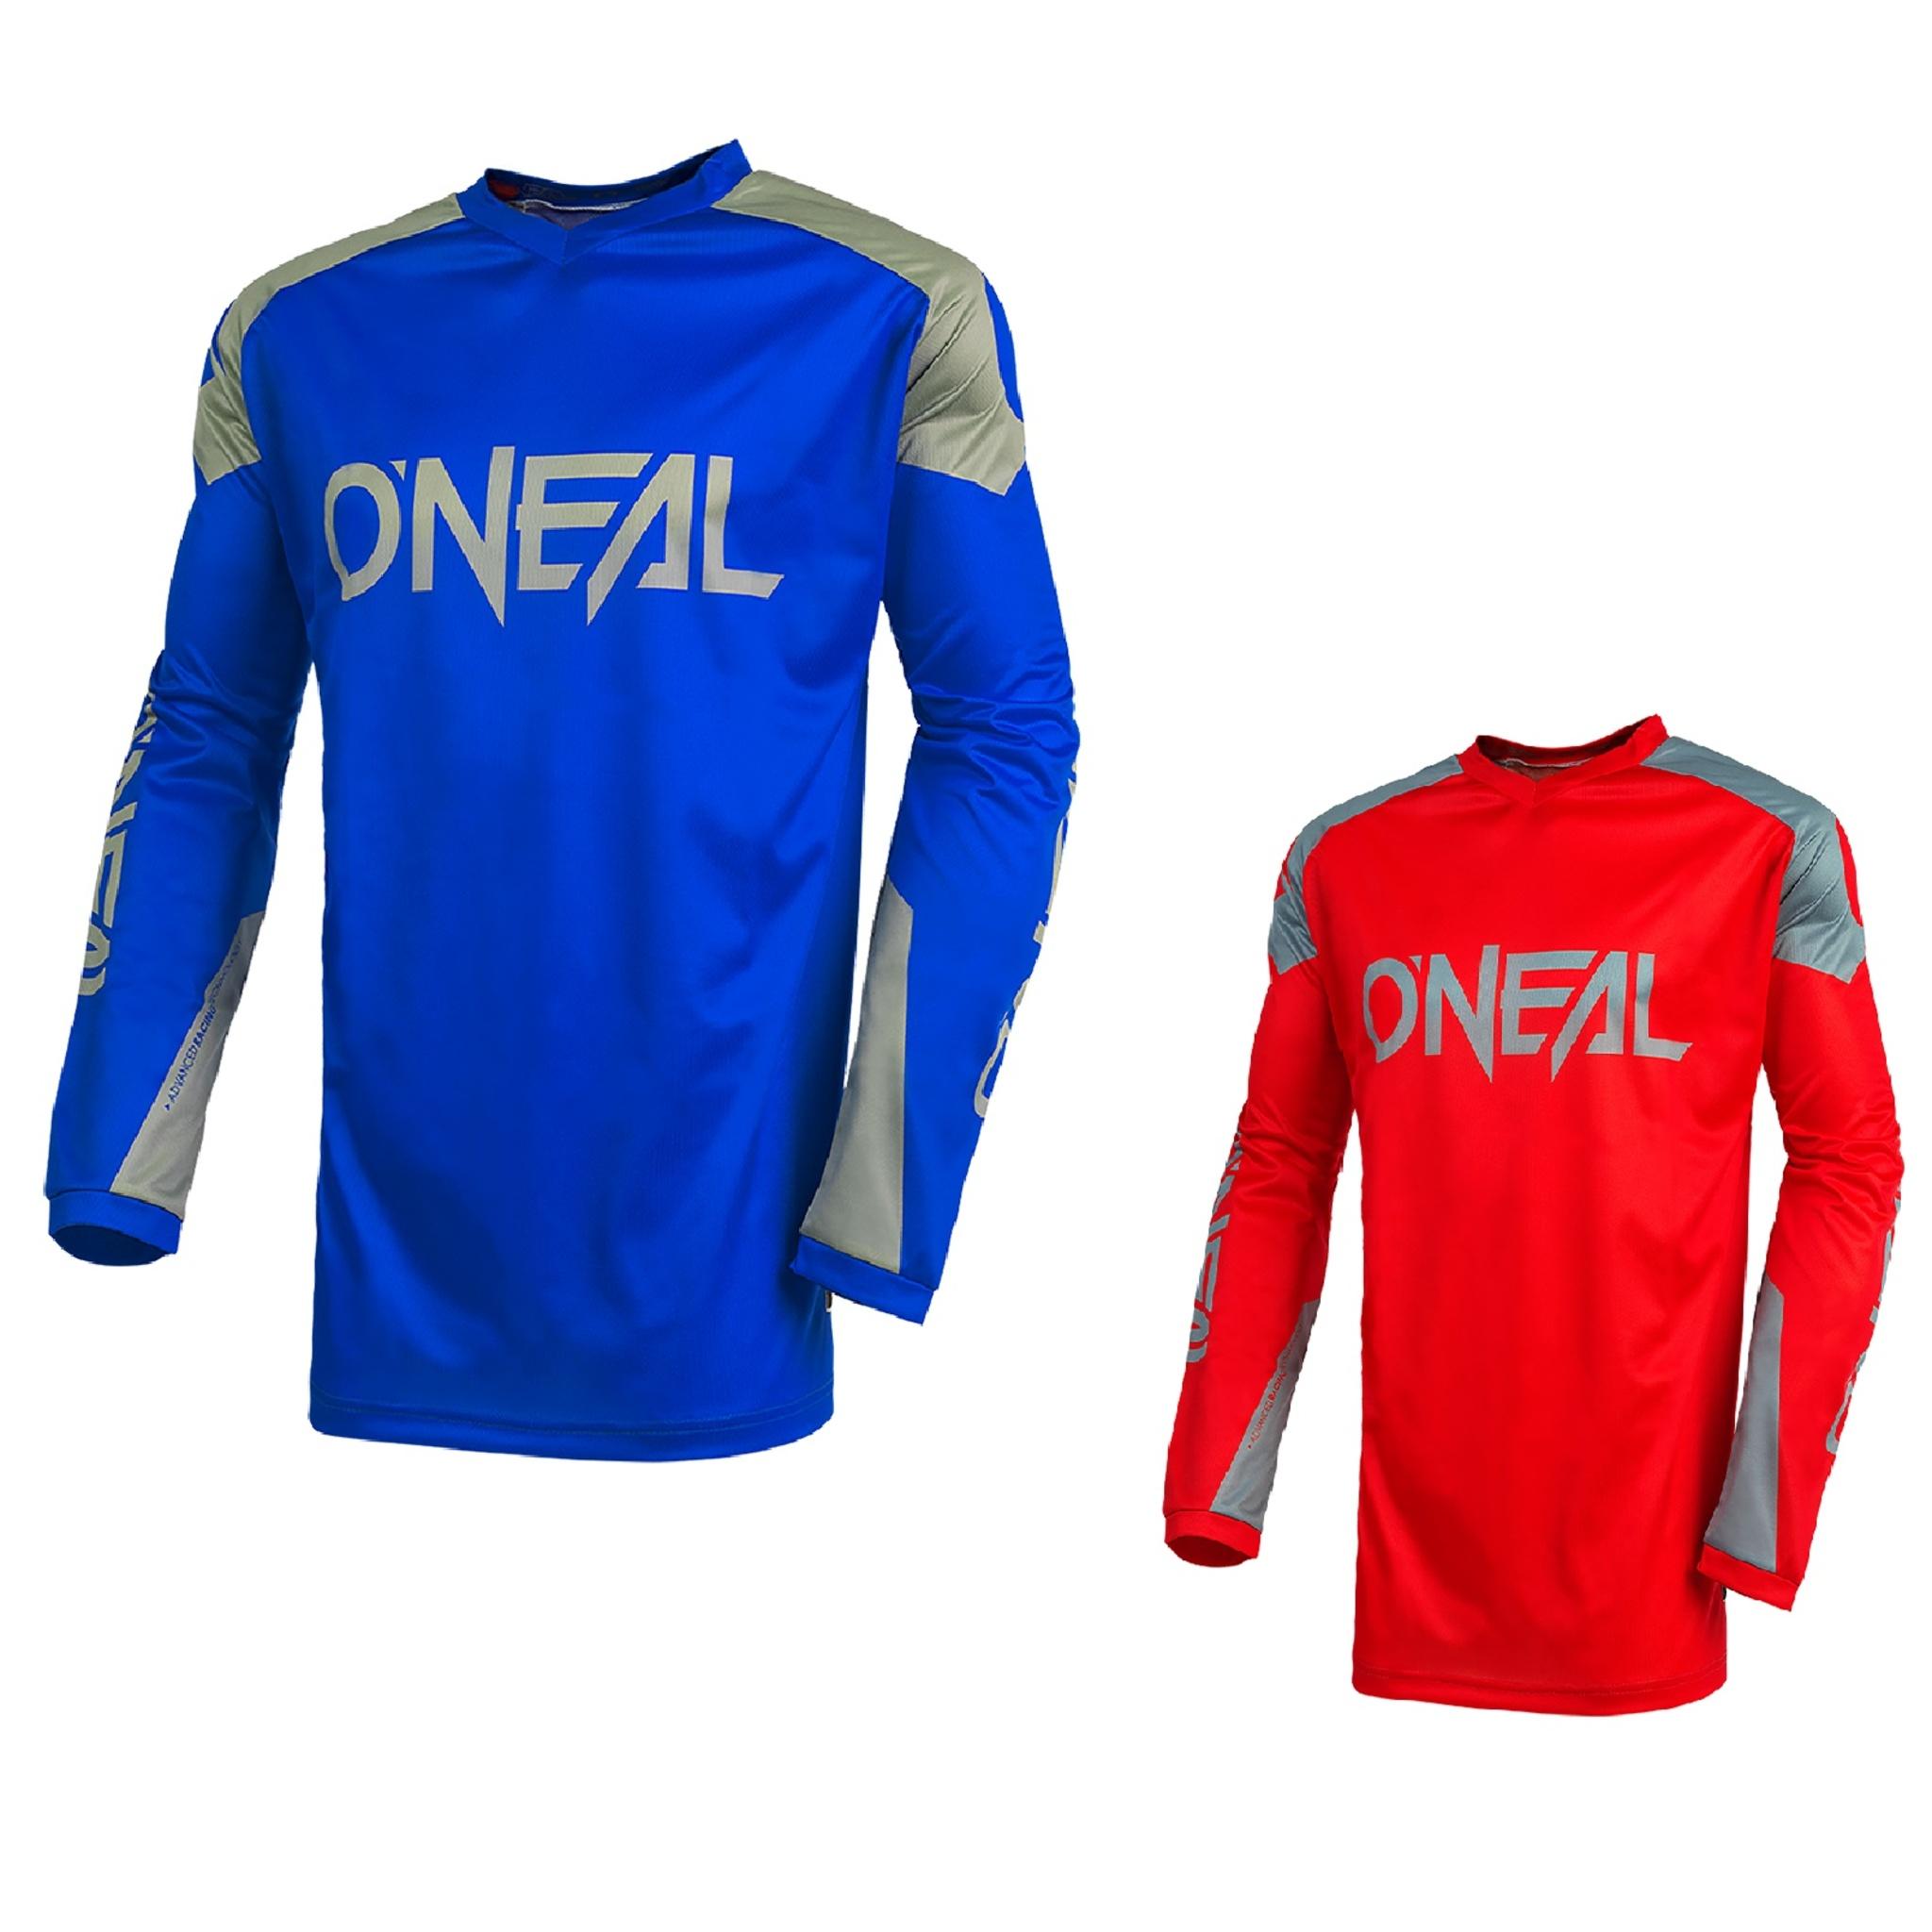 Джерси O'NEAL Matrix Ridewear, мужской(ие)